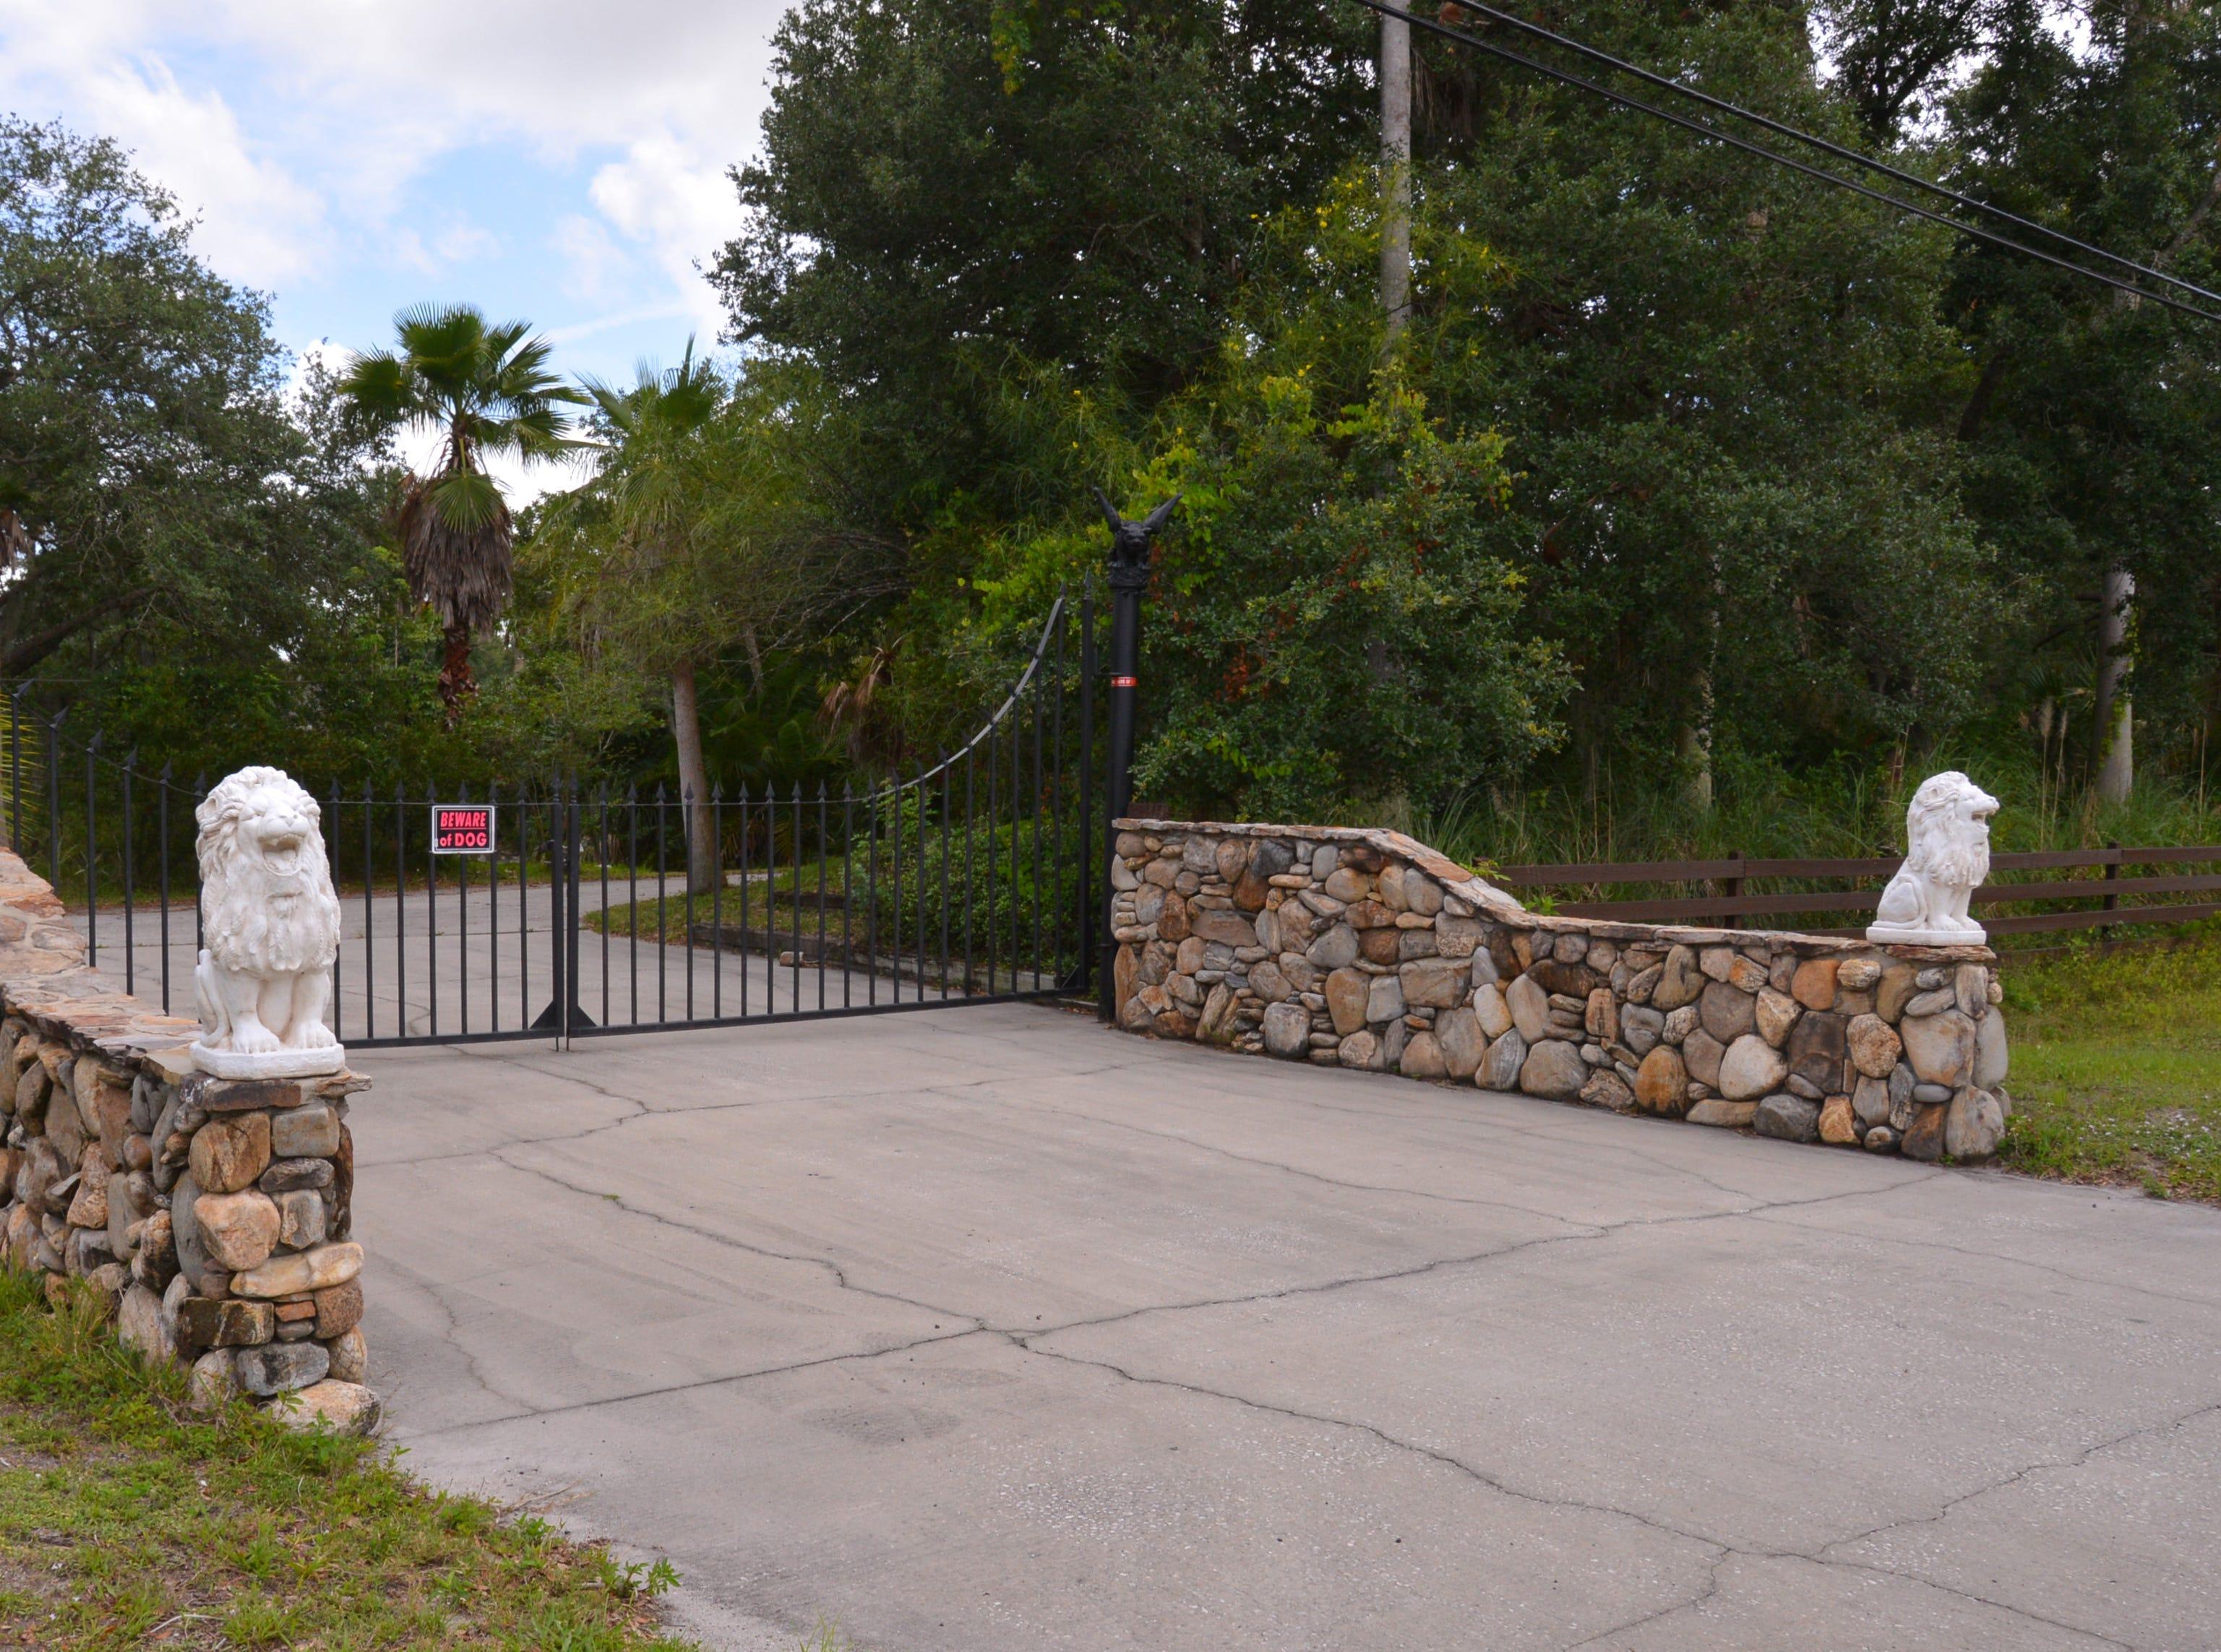 The home at 515 Grant Road, Grant Valkaria.